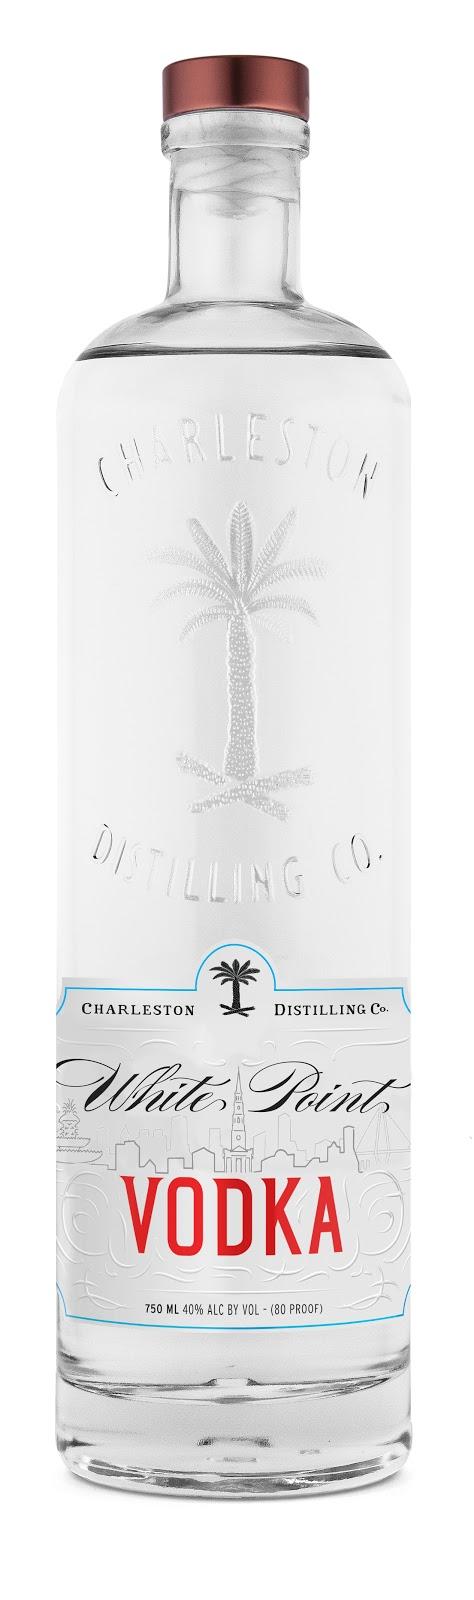 Charleston Distilling Co.   restaurant   3548 Meeks Farm Rd, Johns Island, SC 29455, USA   8437181446 OR +1 843-718-1446